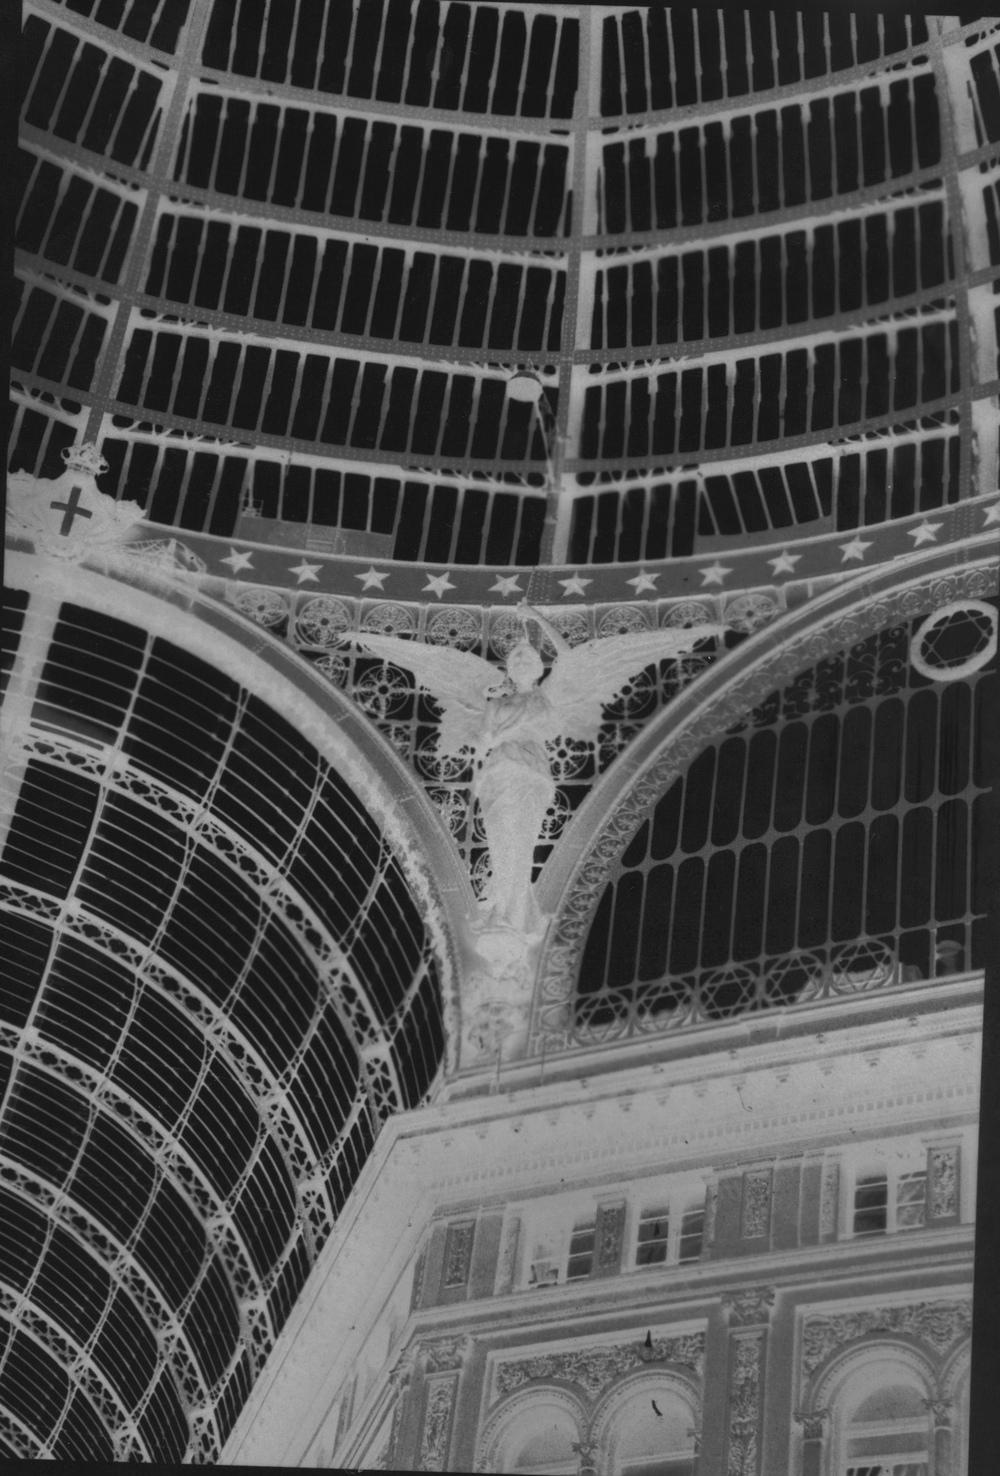 Angel at Galleria Umberto #2